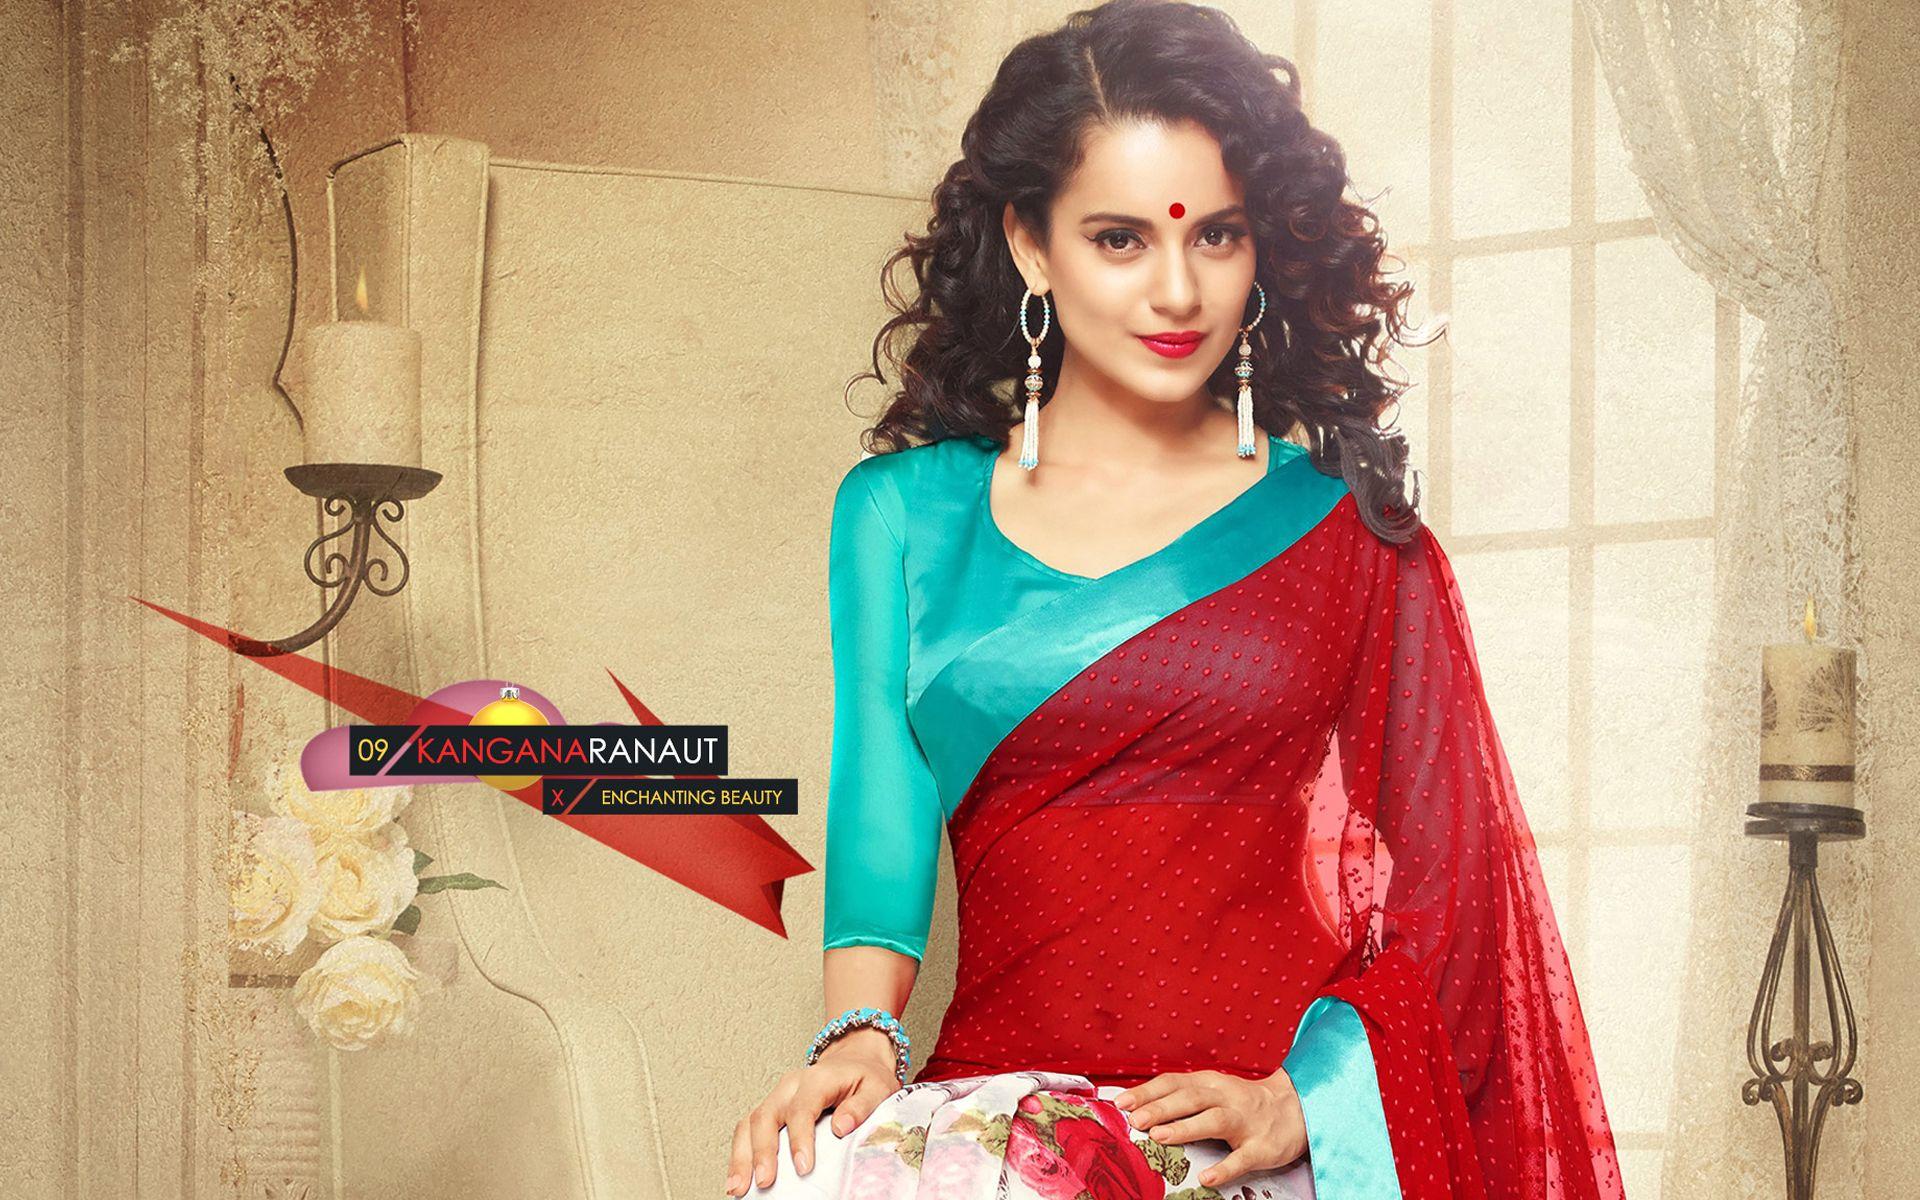 2019 Hd Wallpaper Bollywood Actress In Bikini: Kangana Ranaut Beautiful HD Wallpapers Download